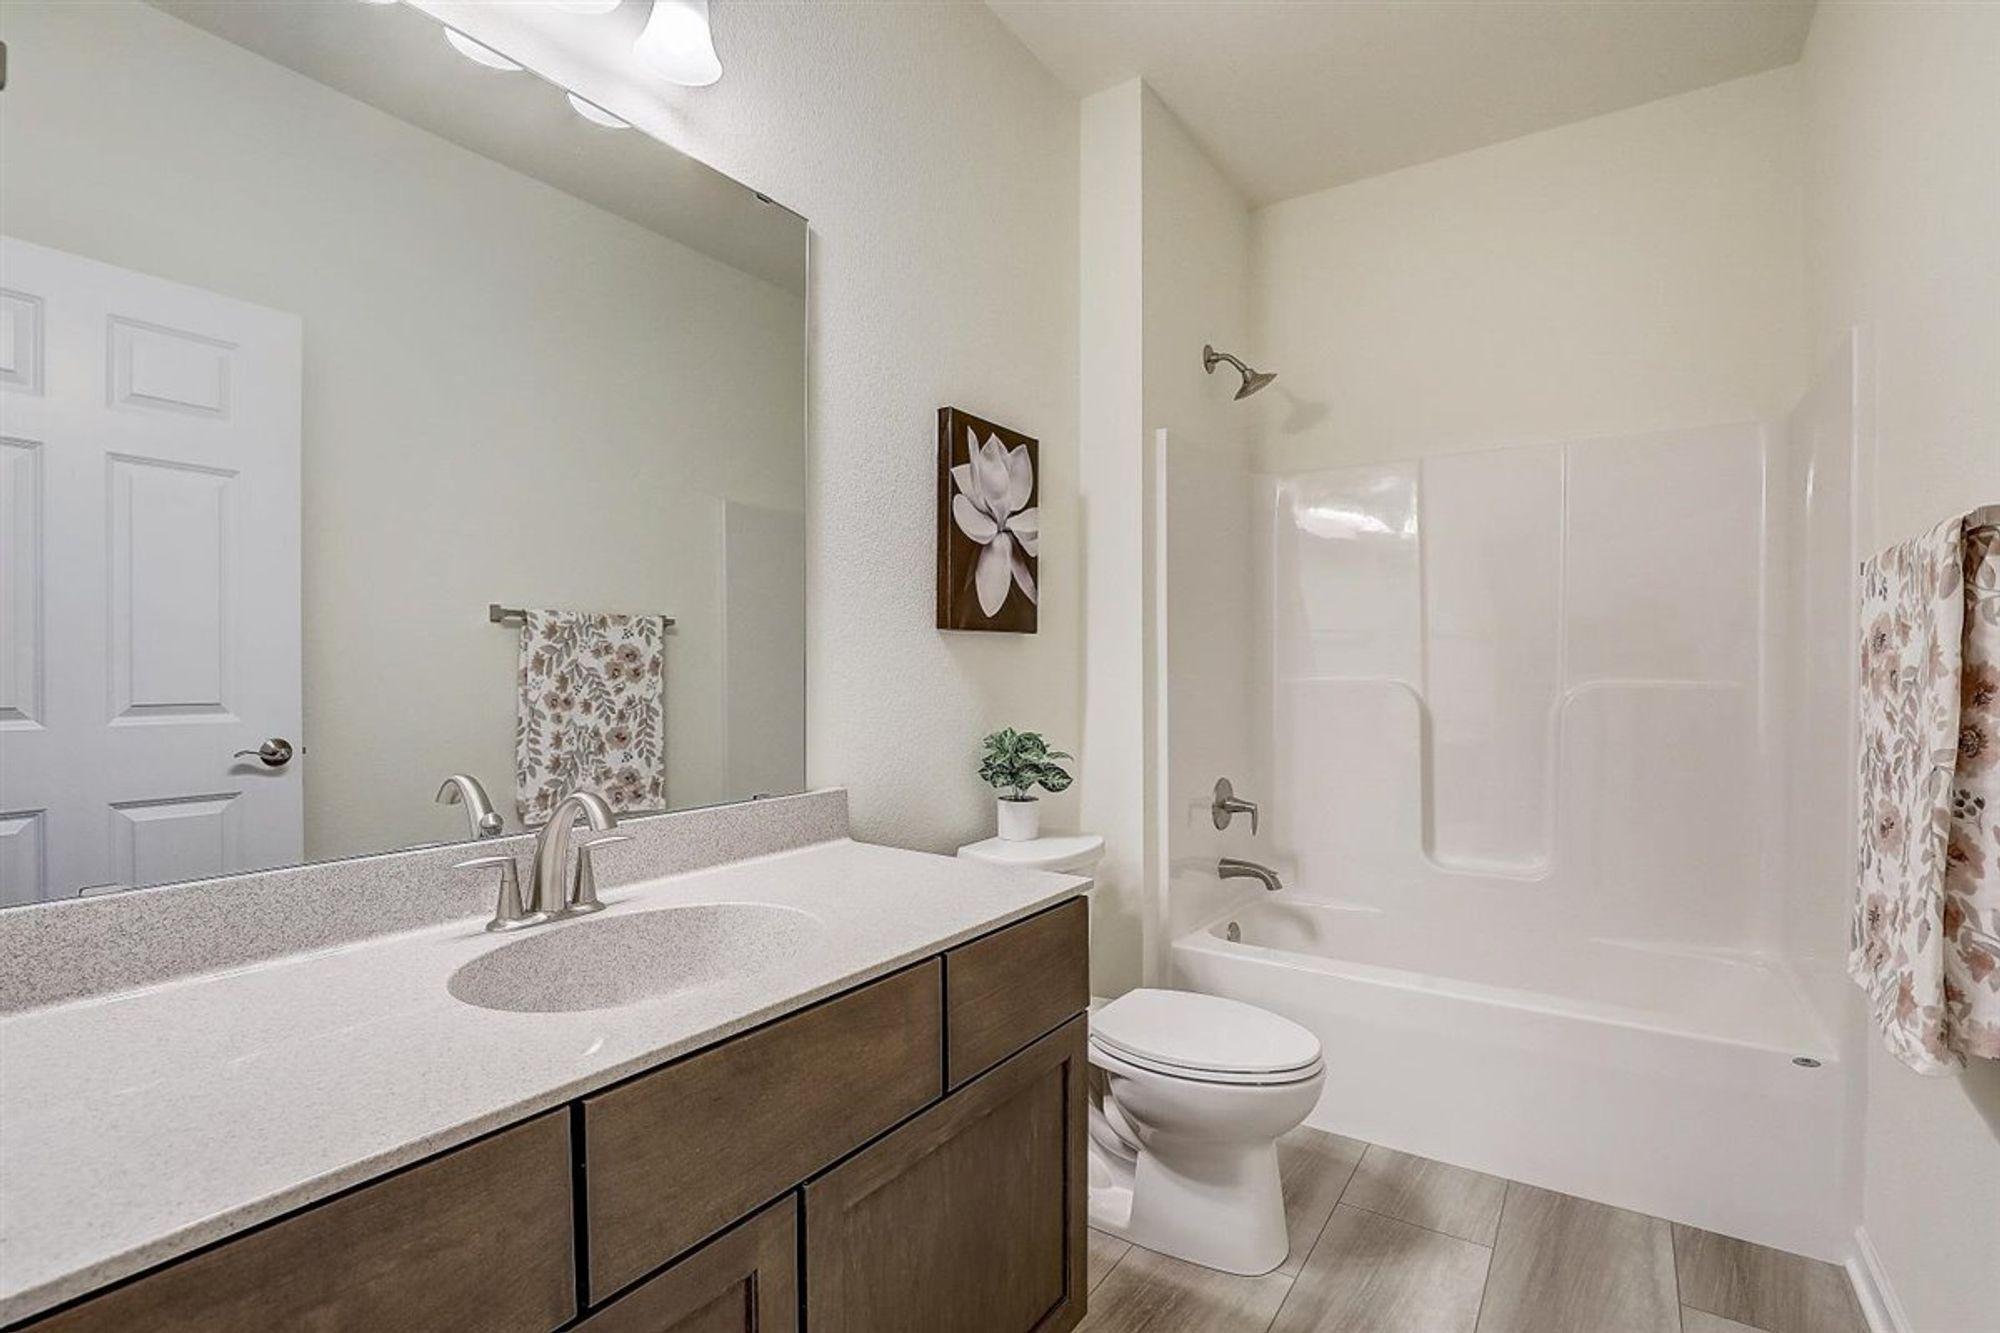 Bathroom featured in The Breckenridge By Halen Homes in Milwaukee-Waukesha, WI